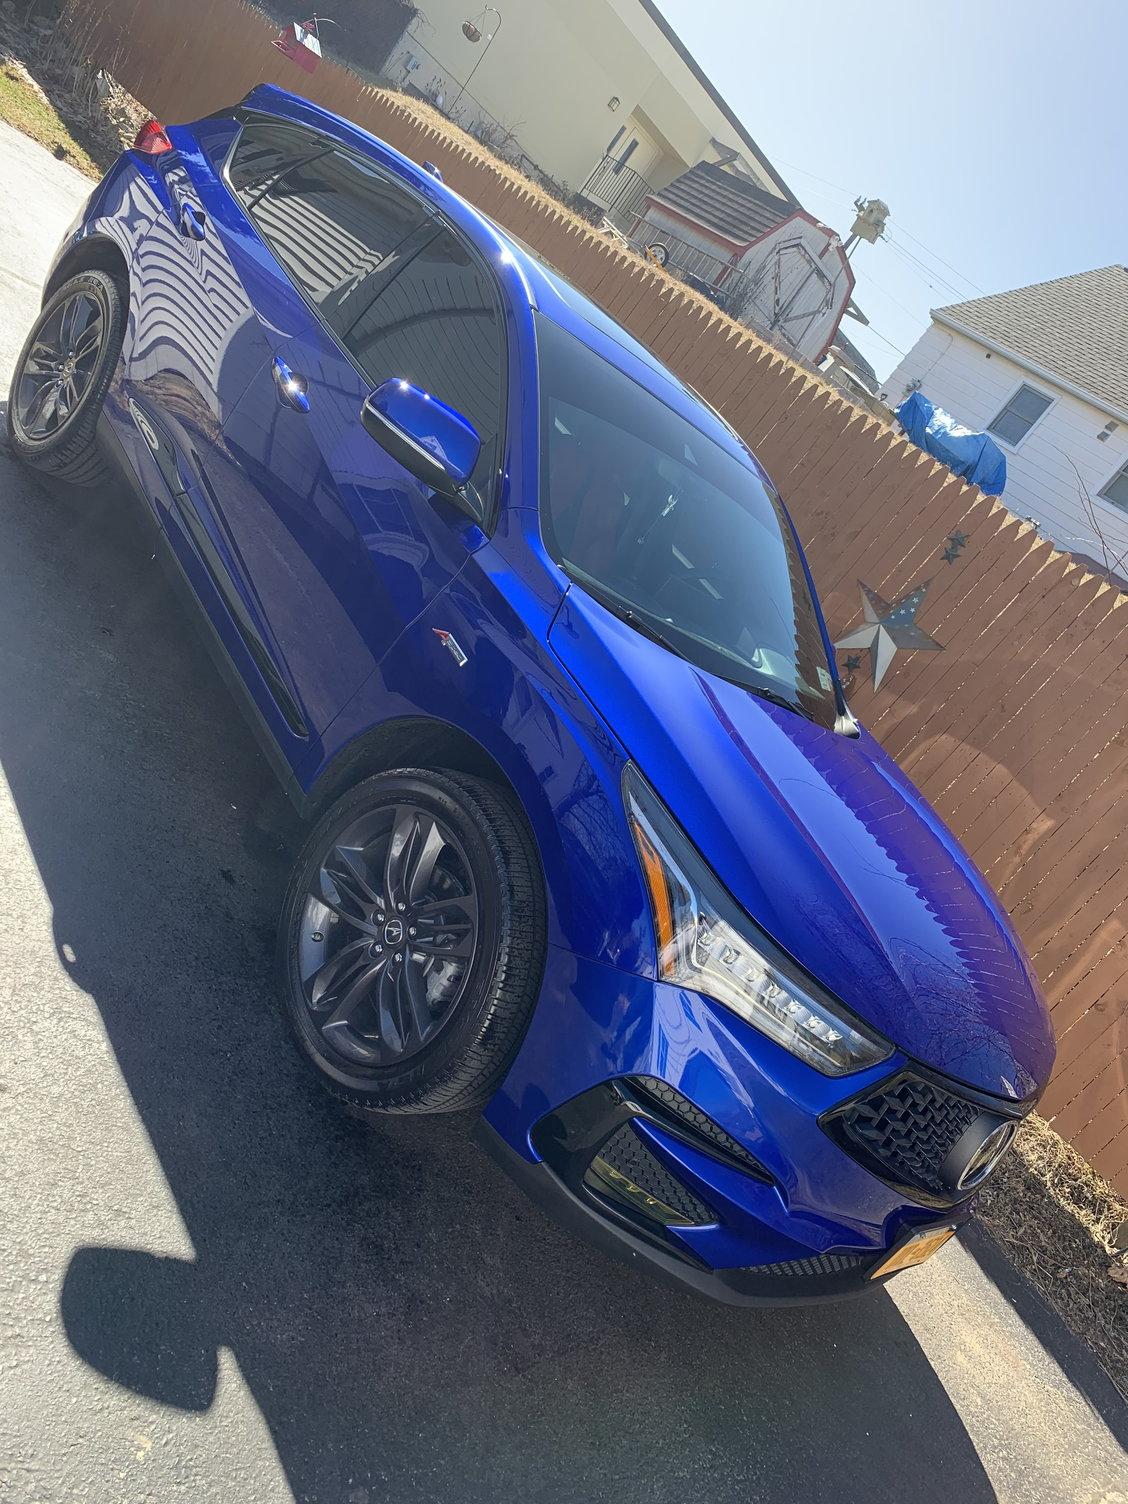 Acura Of Westchester >> My 2019 Rdx Custom Exhaust - AcuraZine - Acura Enthusiast Community